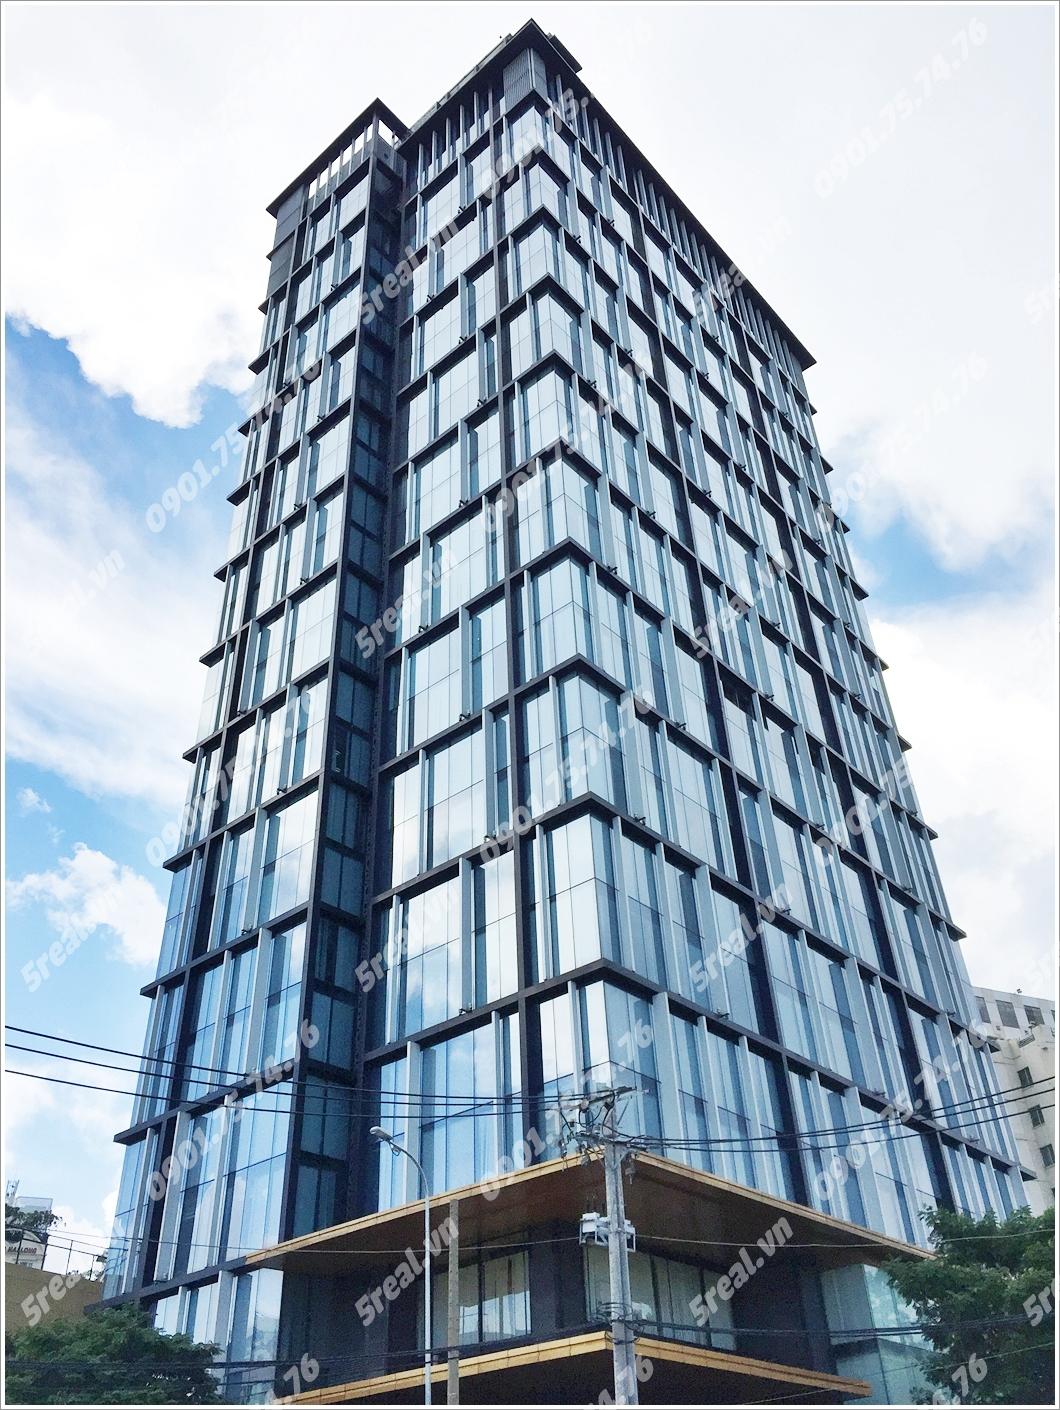 ab-tower-le-lai-quan-1-van-phong-cho-thue-5real.vn-01